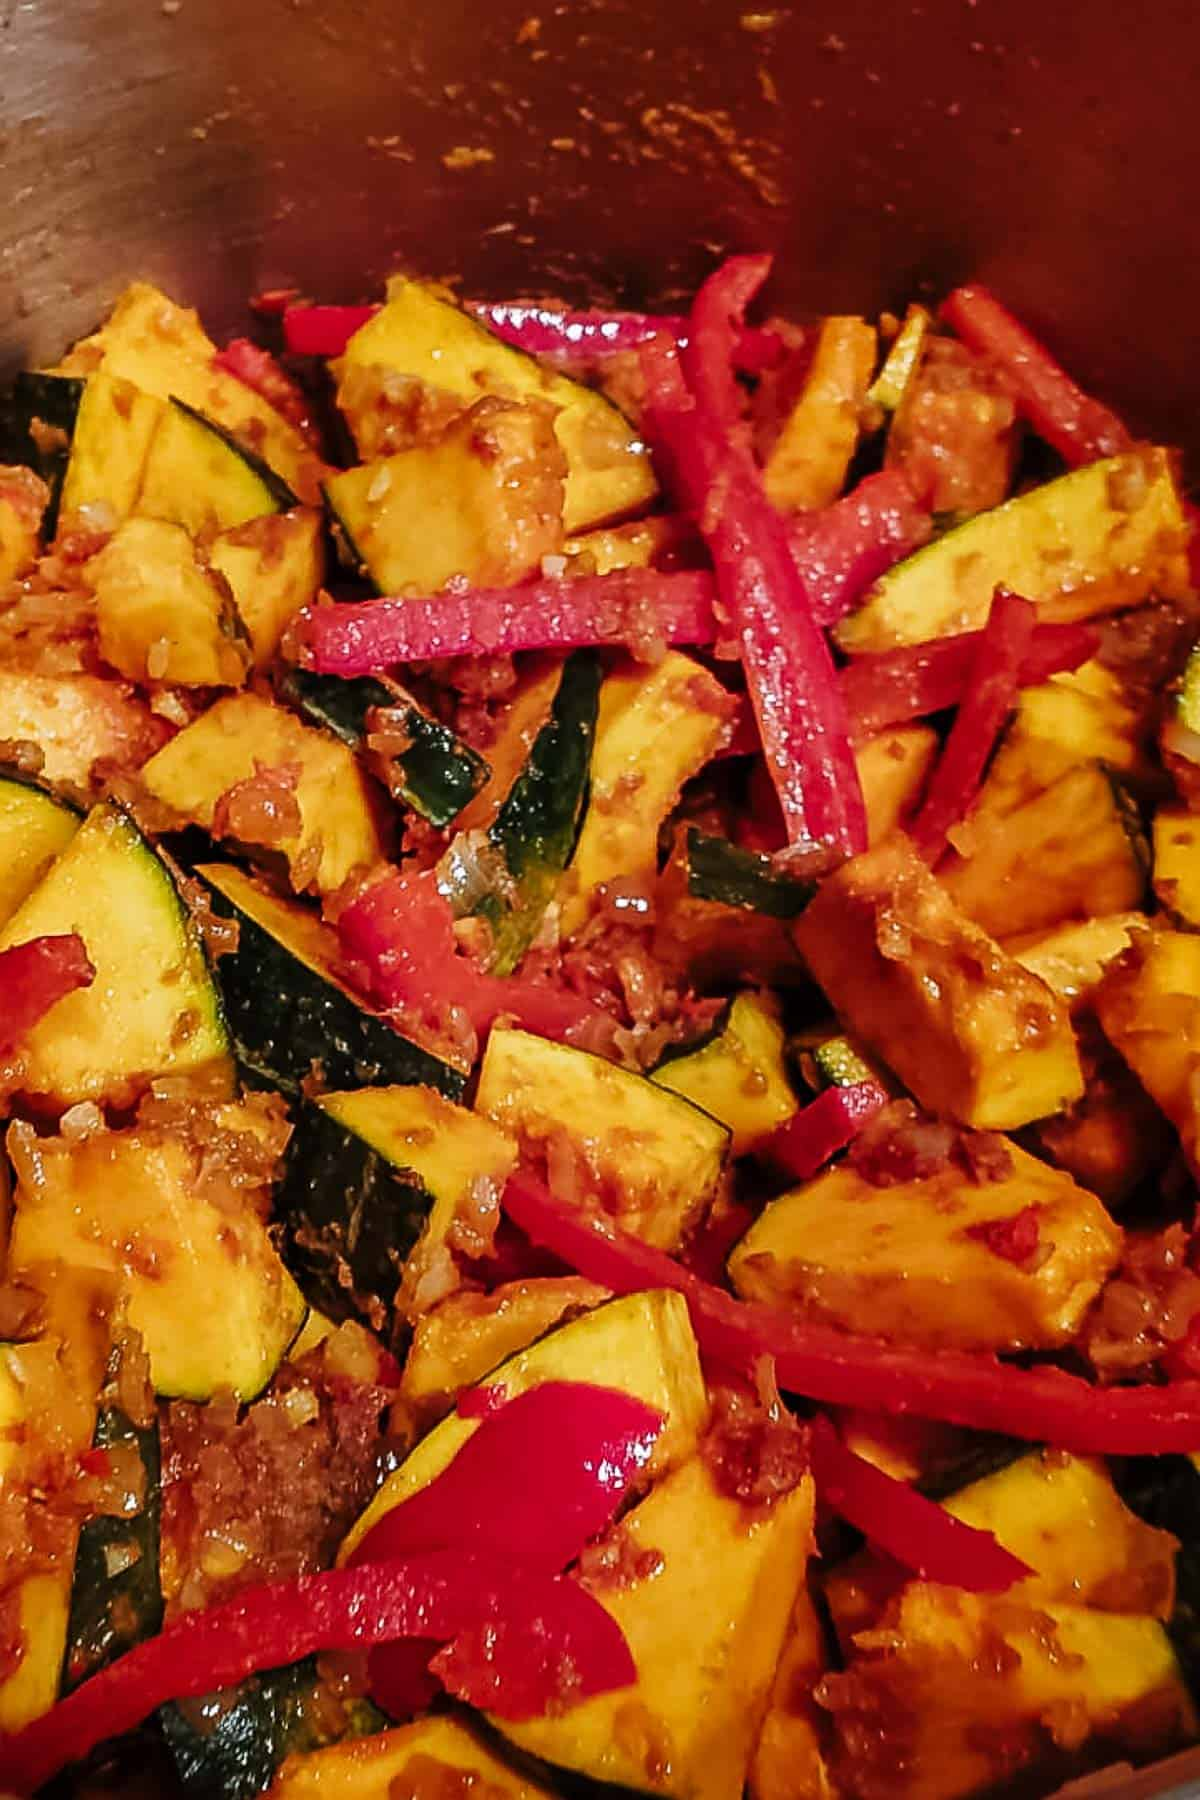 Kabocha Squash, Peppers, & Seasonings In A Pot